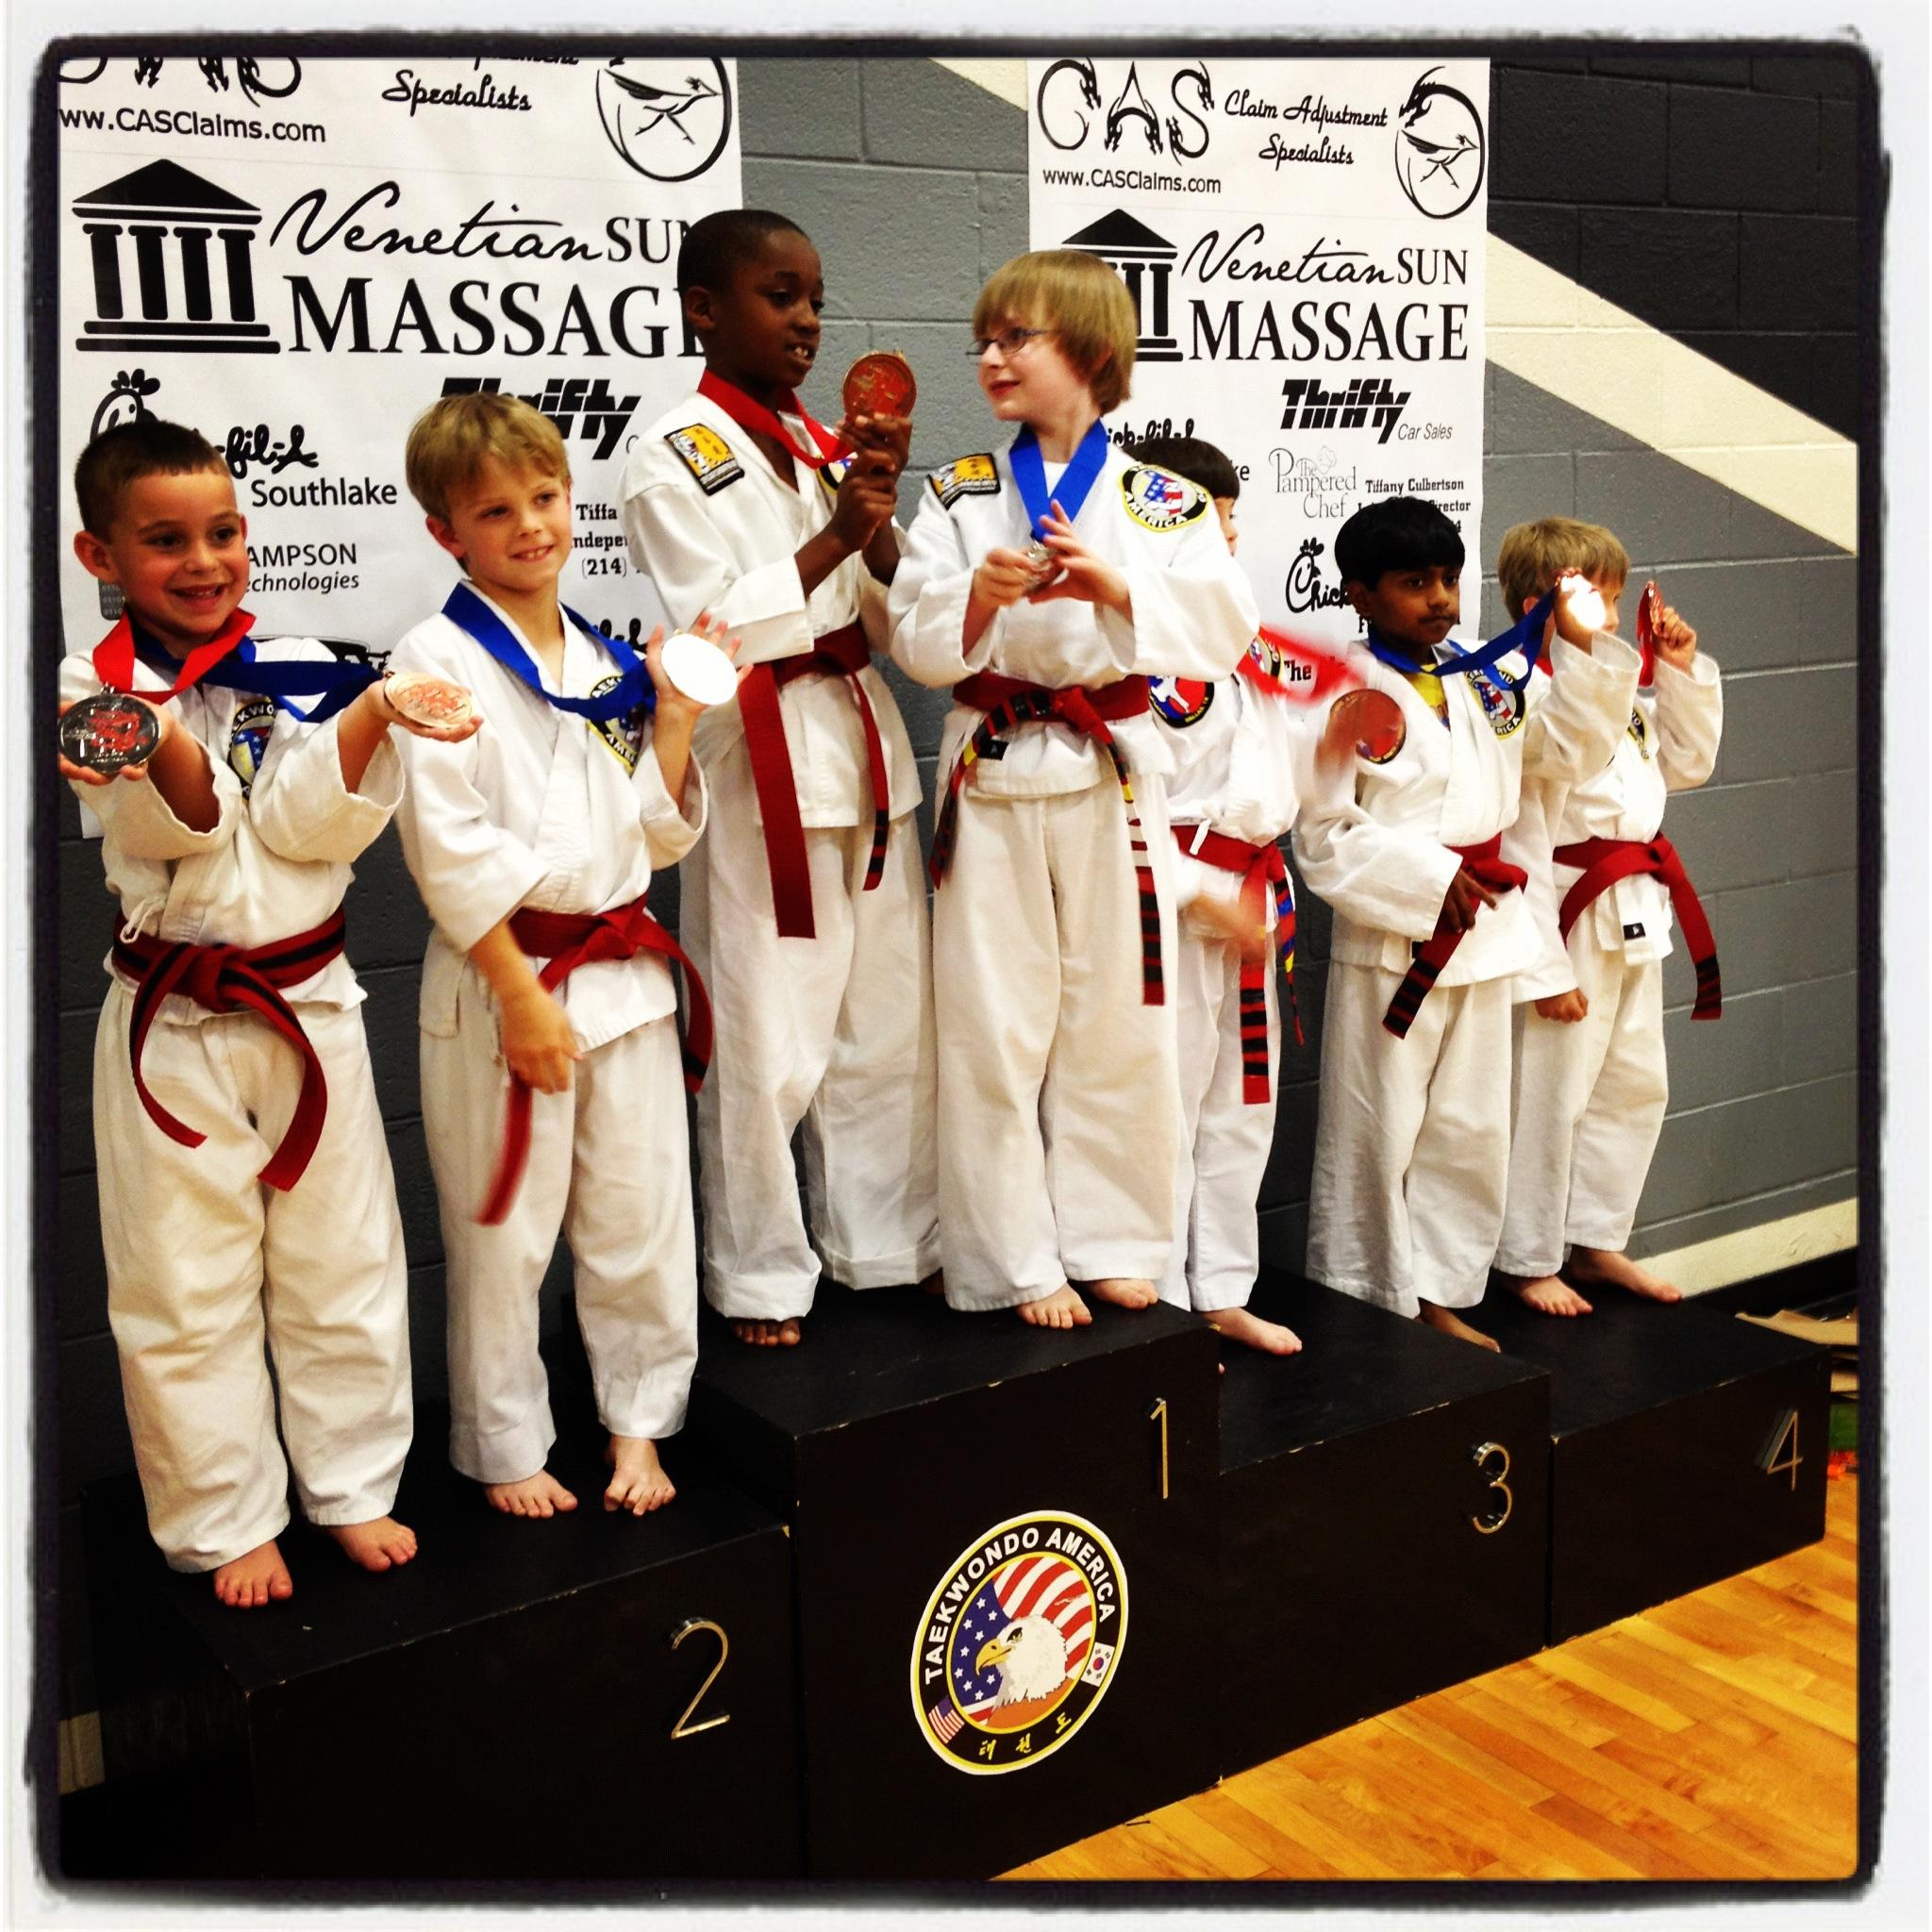 Martial Arts Students From Southlake TX At Tournament.jpg